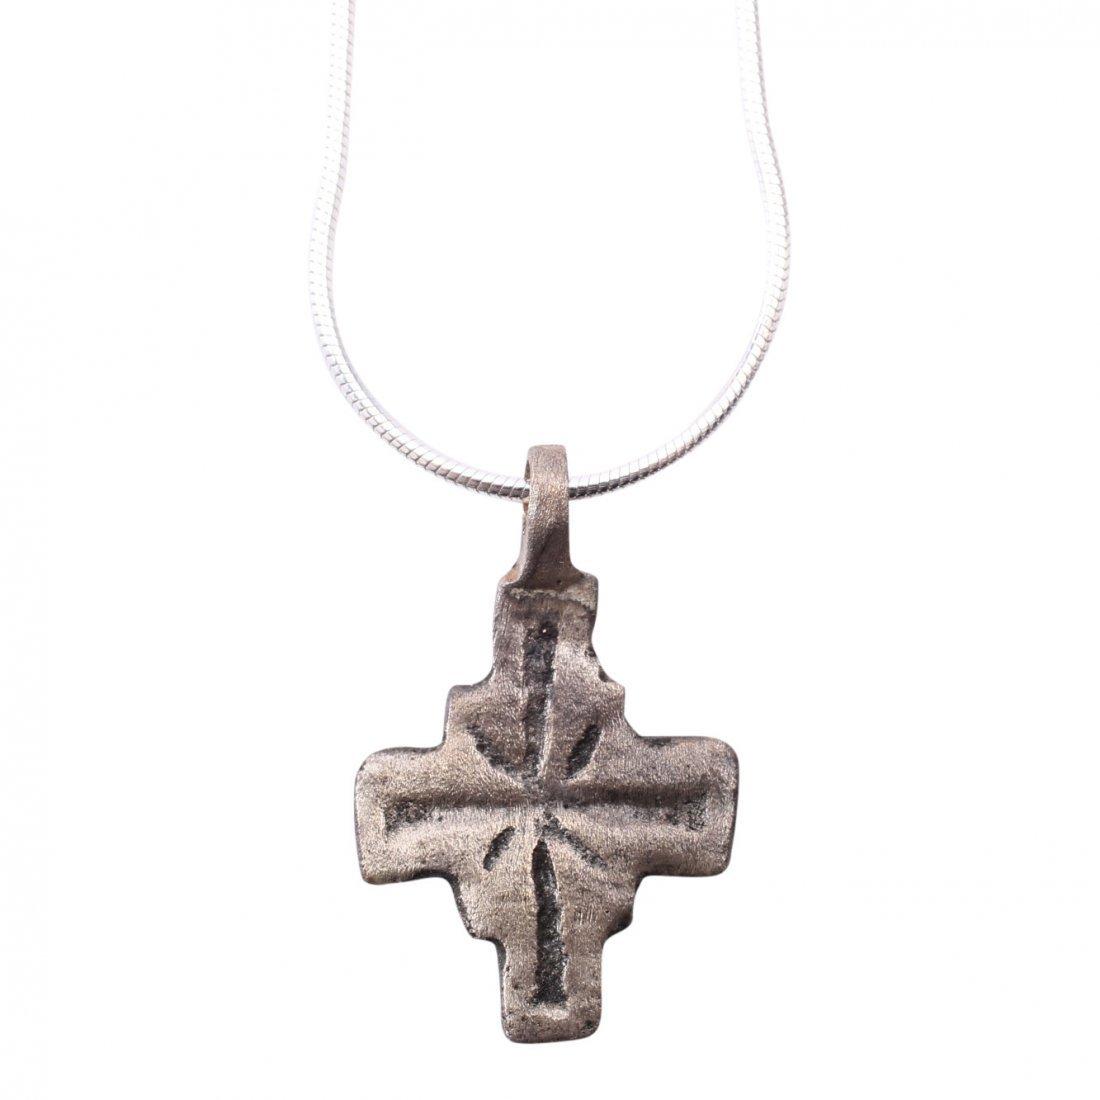 Byzantine Pilgrim's Cross 5-8th C